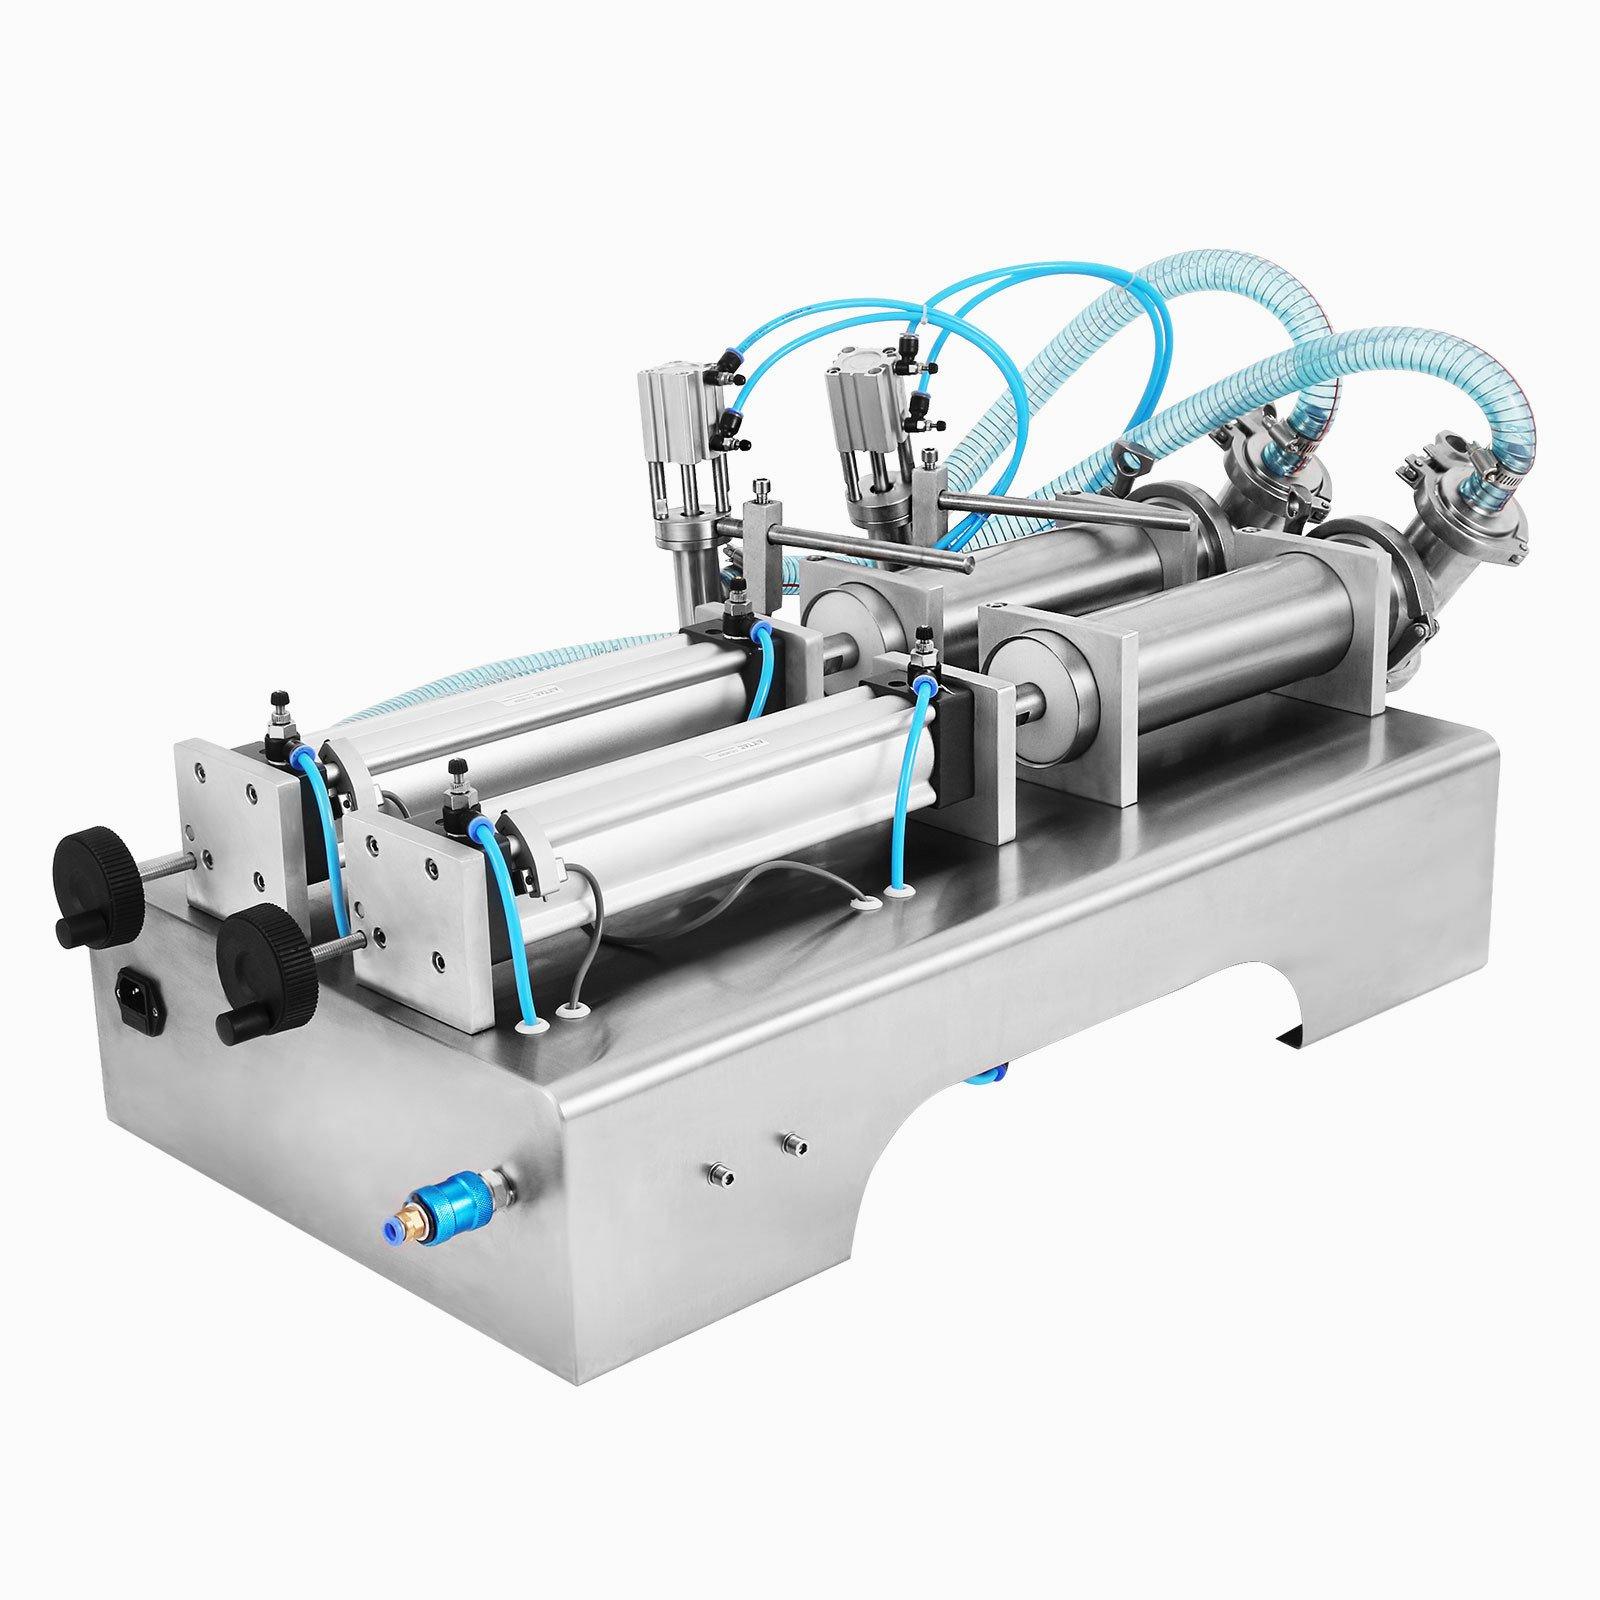 Forkwin Horizontal Full Pneumatic Liquid Filling Machine 100-1000ml Liquid Filling Machine Semi Automatic 10-40bottles/min Liquid Filling Machine for High Viscosity Fluid